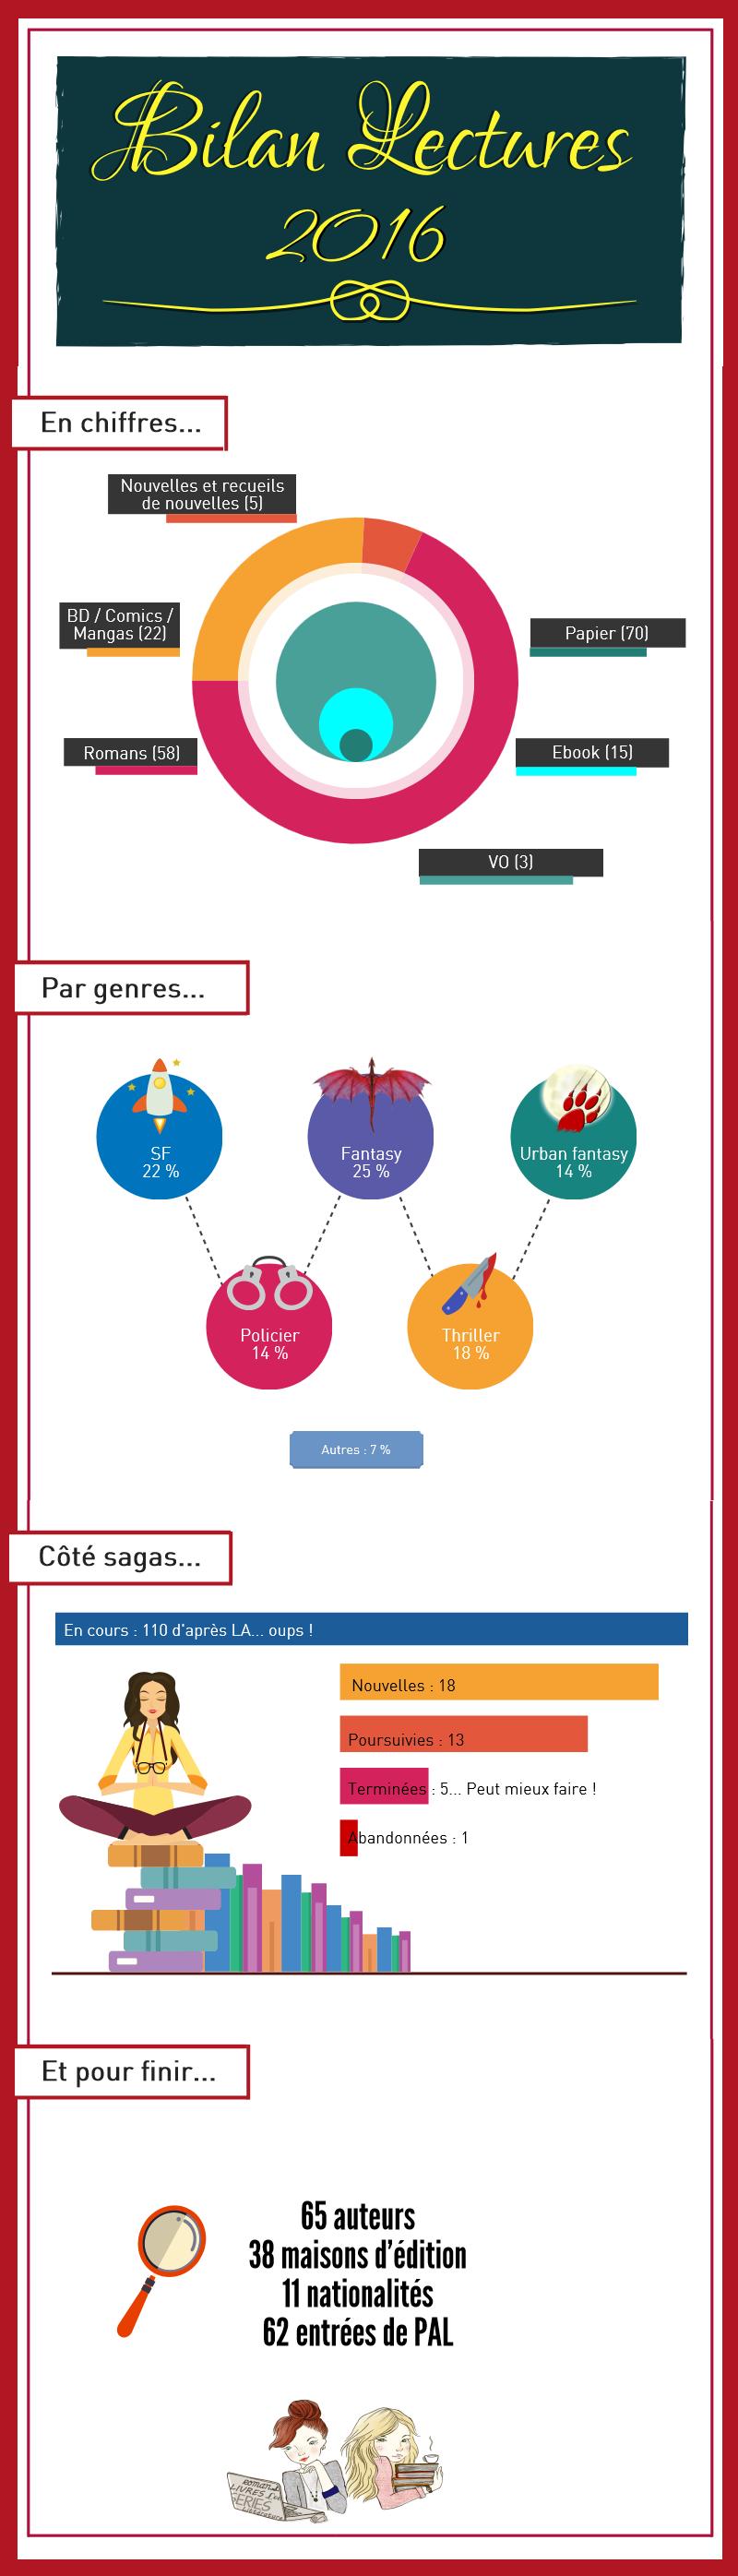 infographie bilan lectures 2016